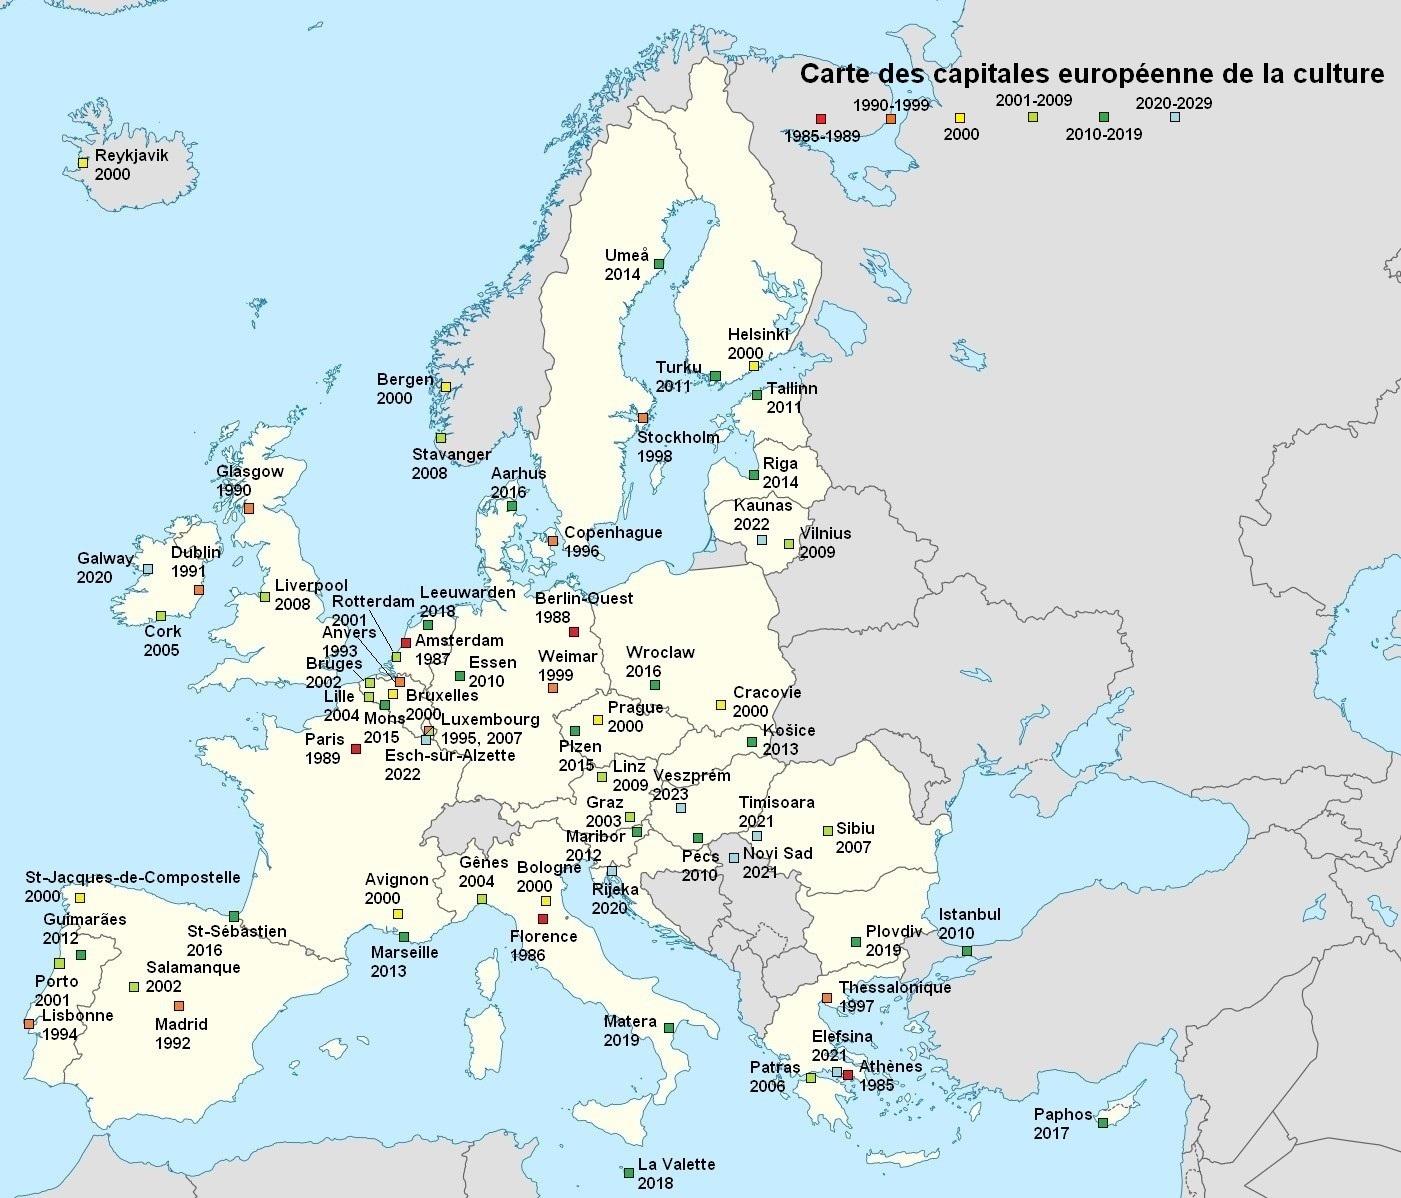 File:carte Des Capitales Européennes De La Culture tout Carte Capitale Europe